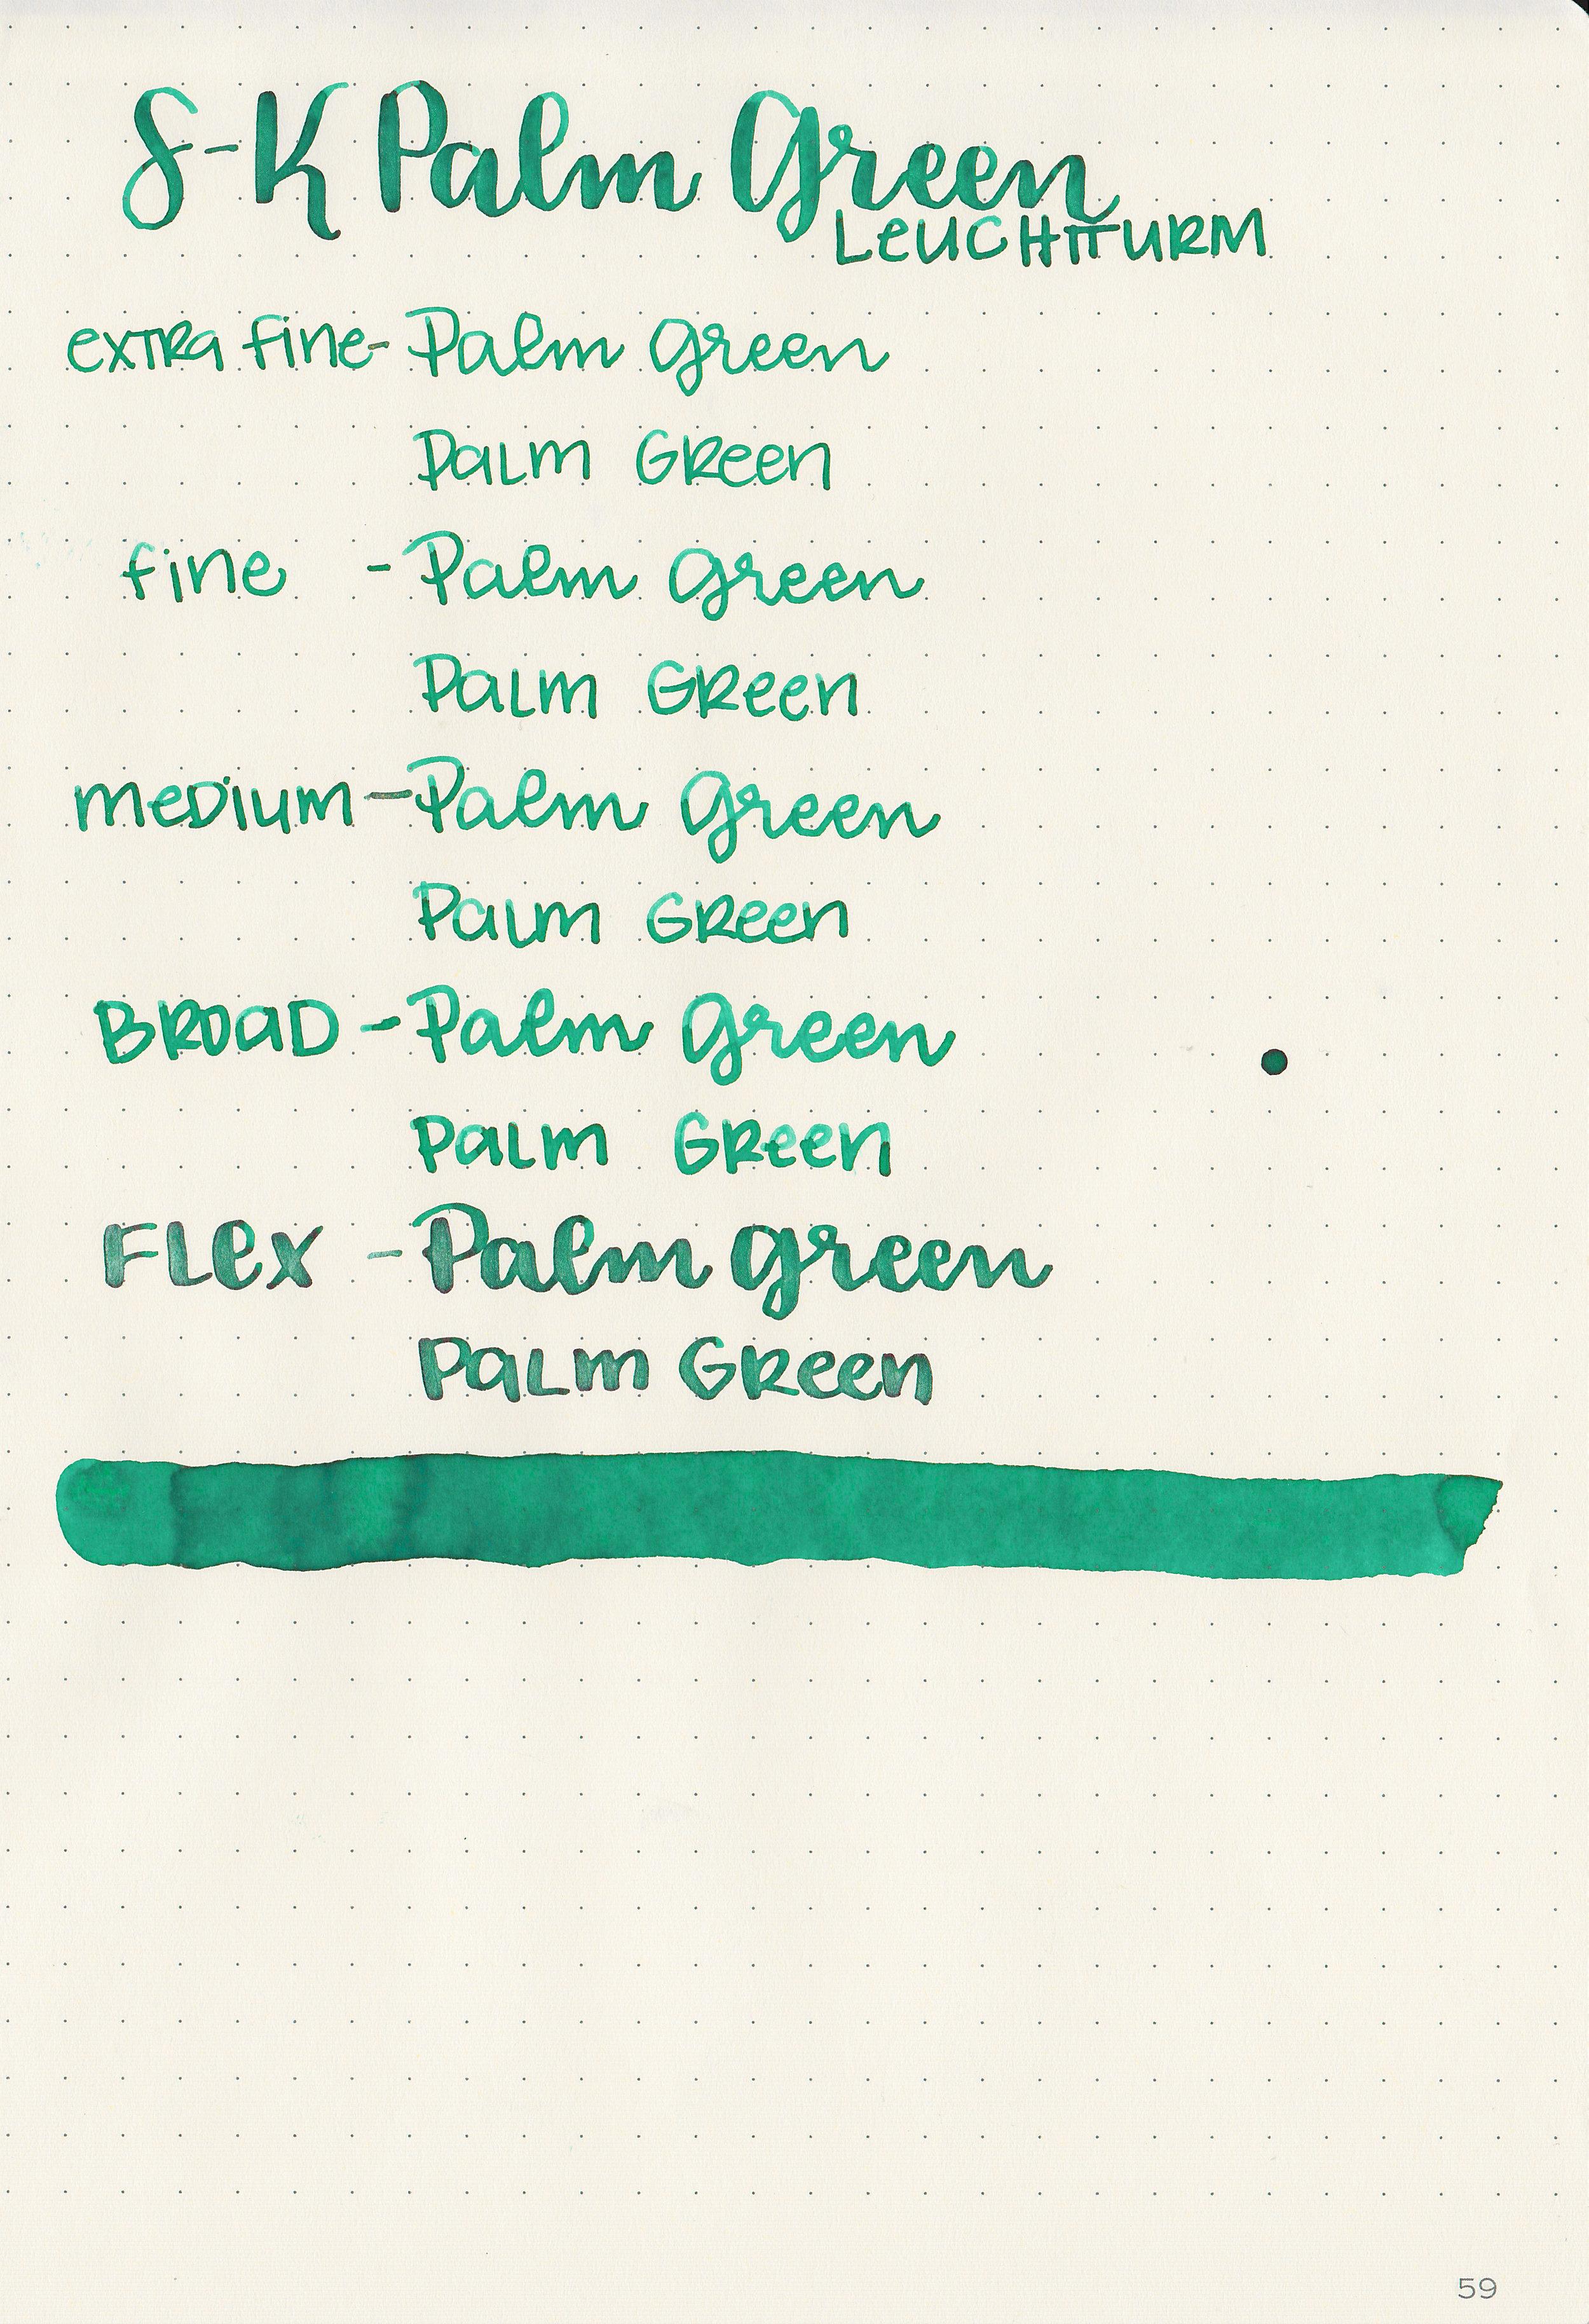 sk-palm-green-11.jpg